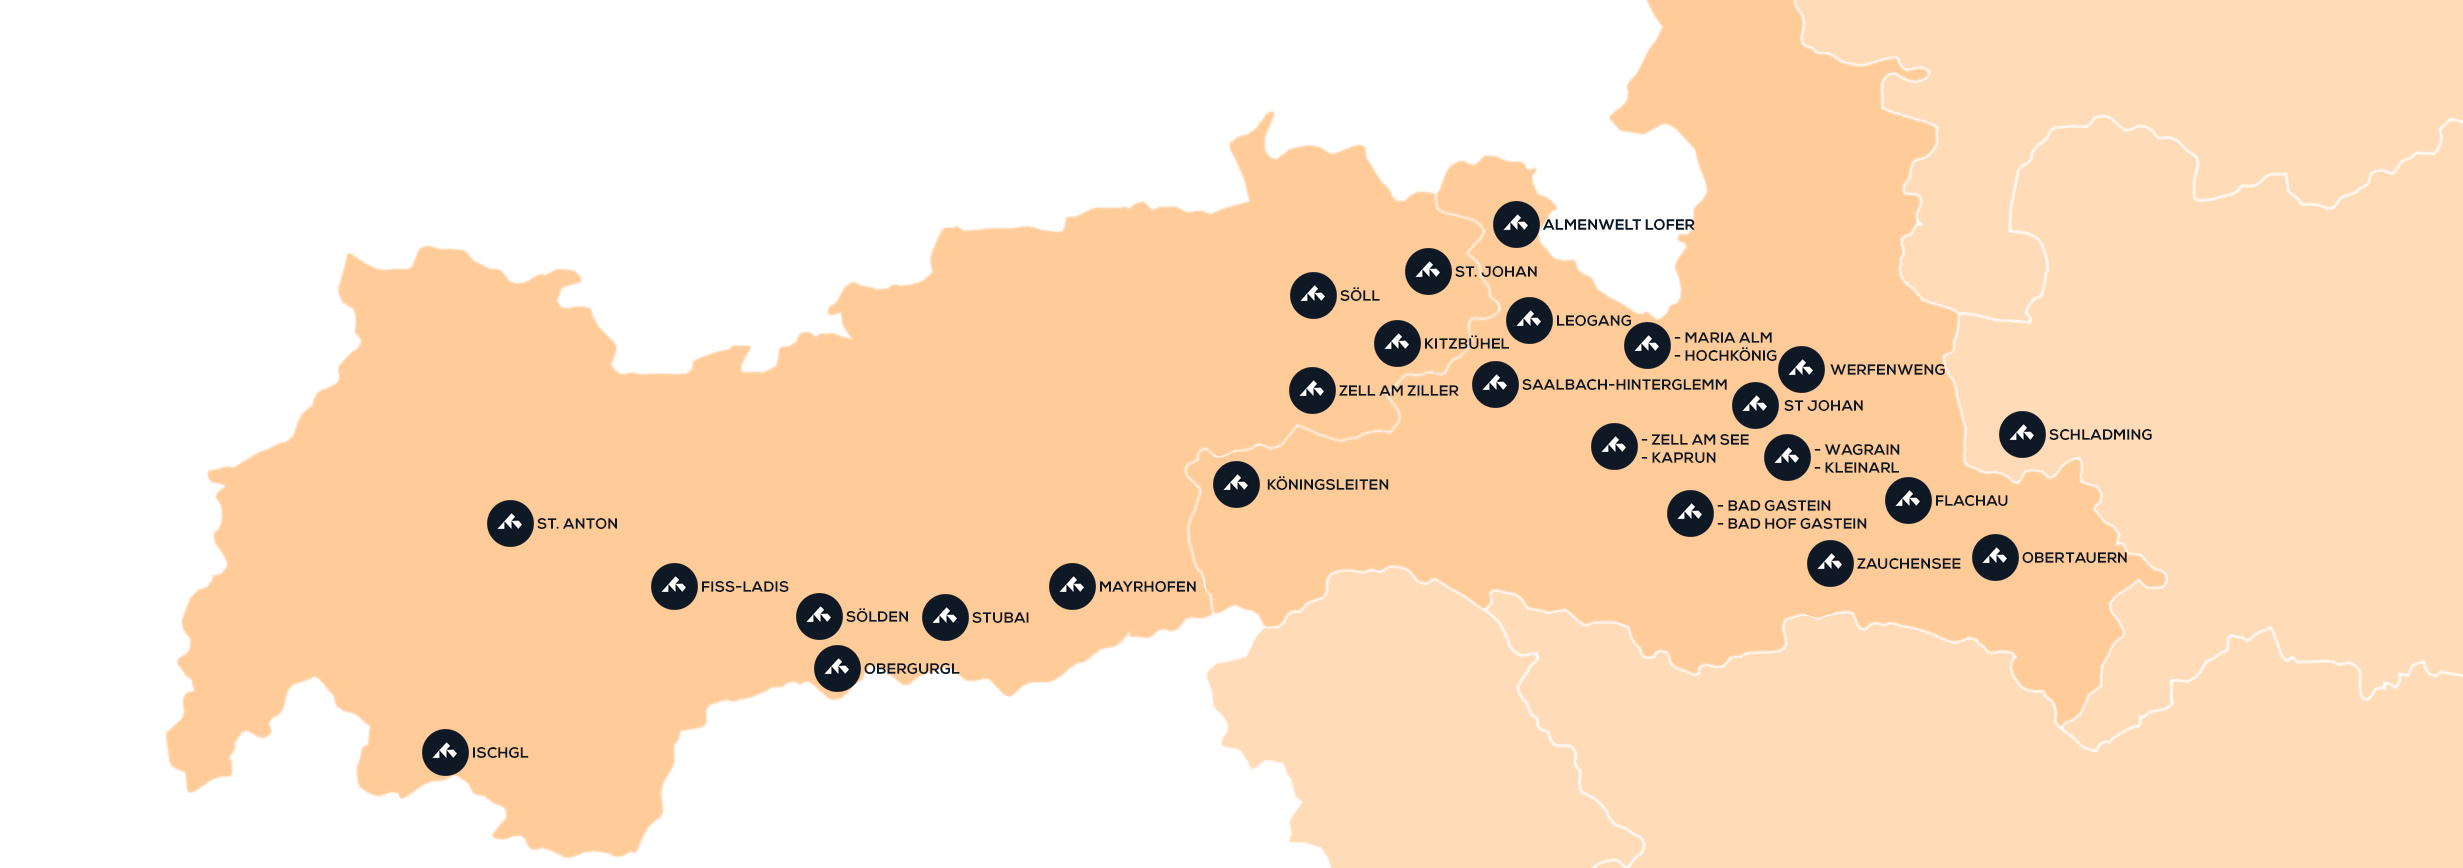 Map of ski destinations in Austria